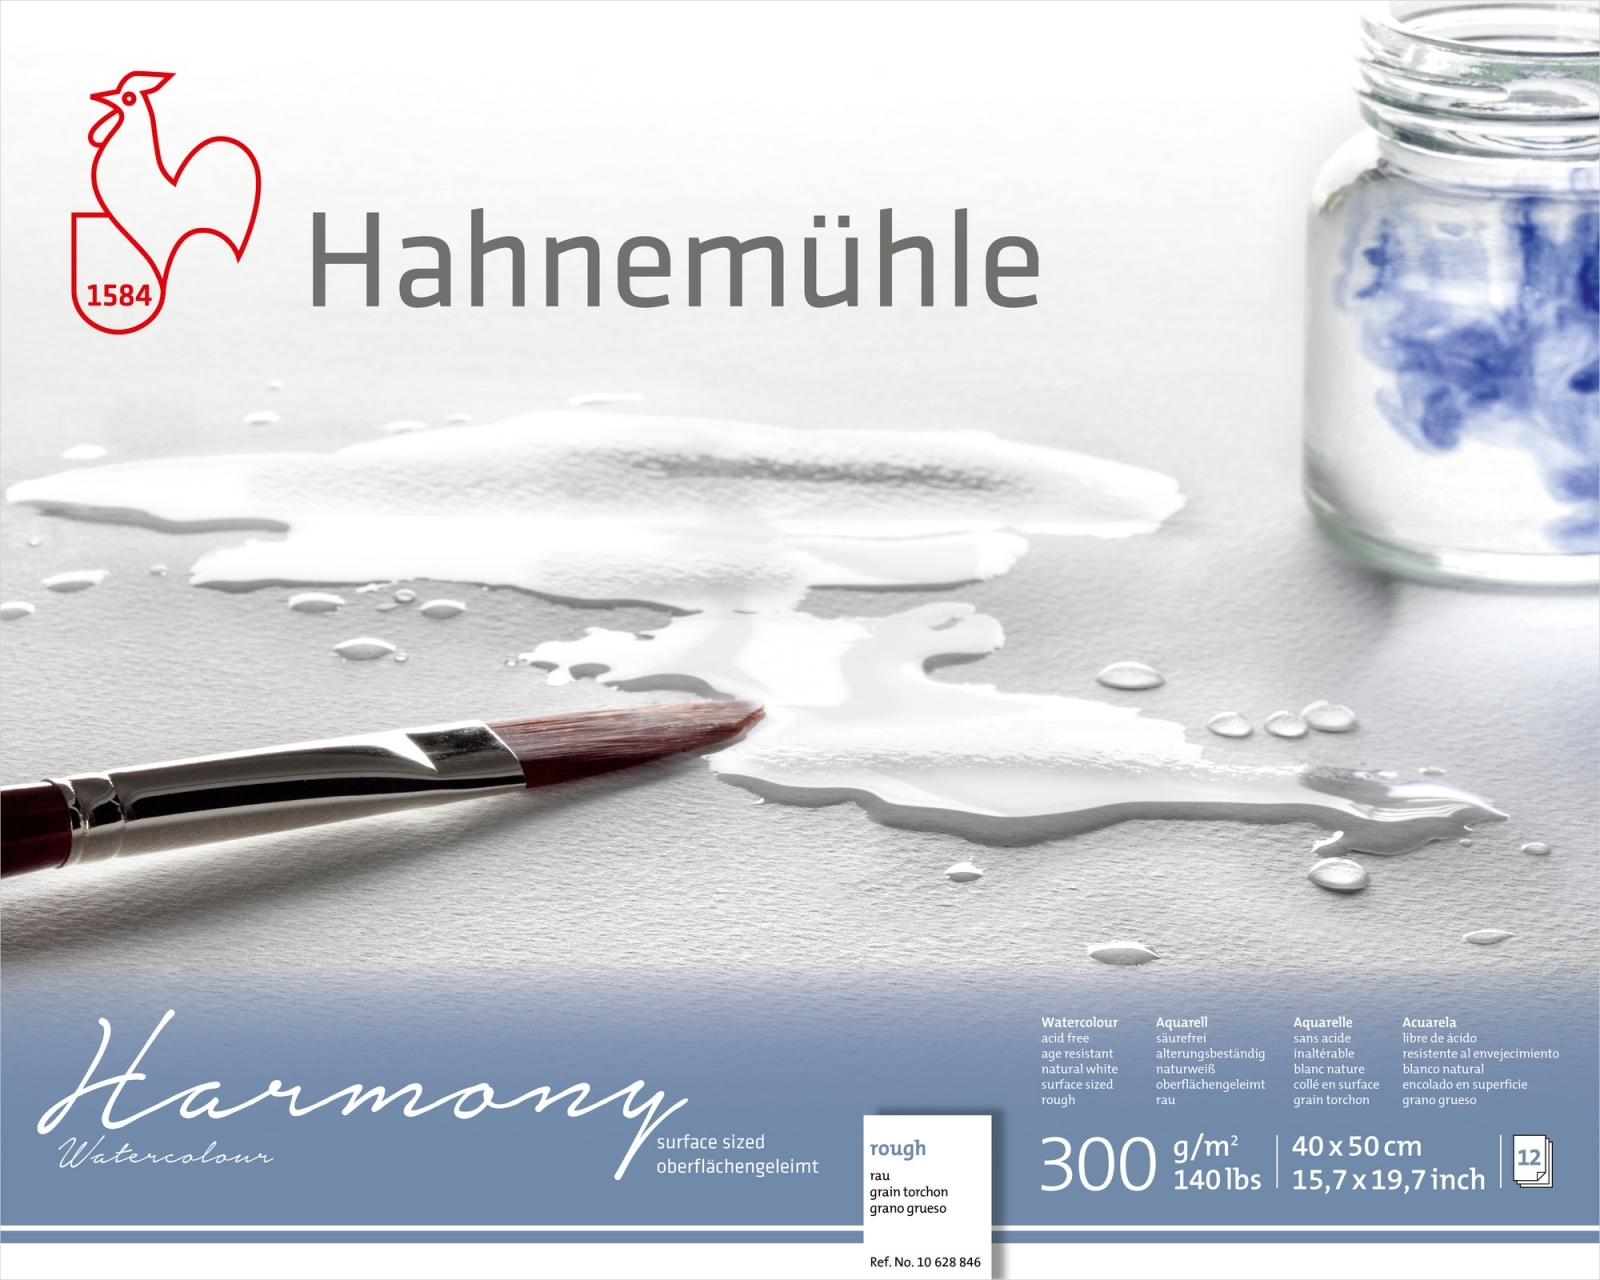 PAPEL HAHNEMUHLE HARMONY WATERCOLOUR, 300 G/M², ROUGH 12fls 40x50 (10628846)  - Papelaria Botafogo